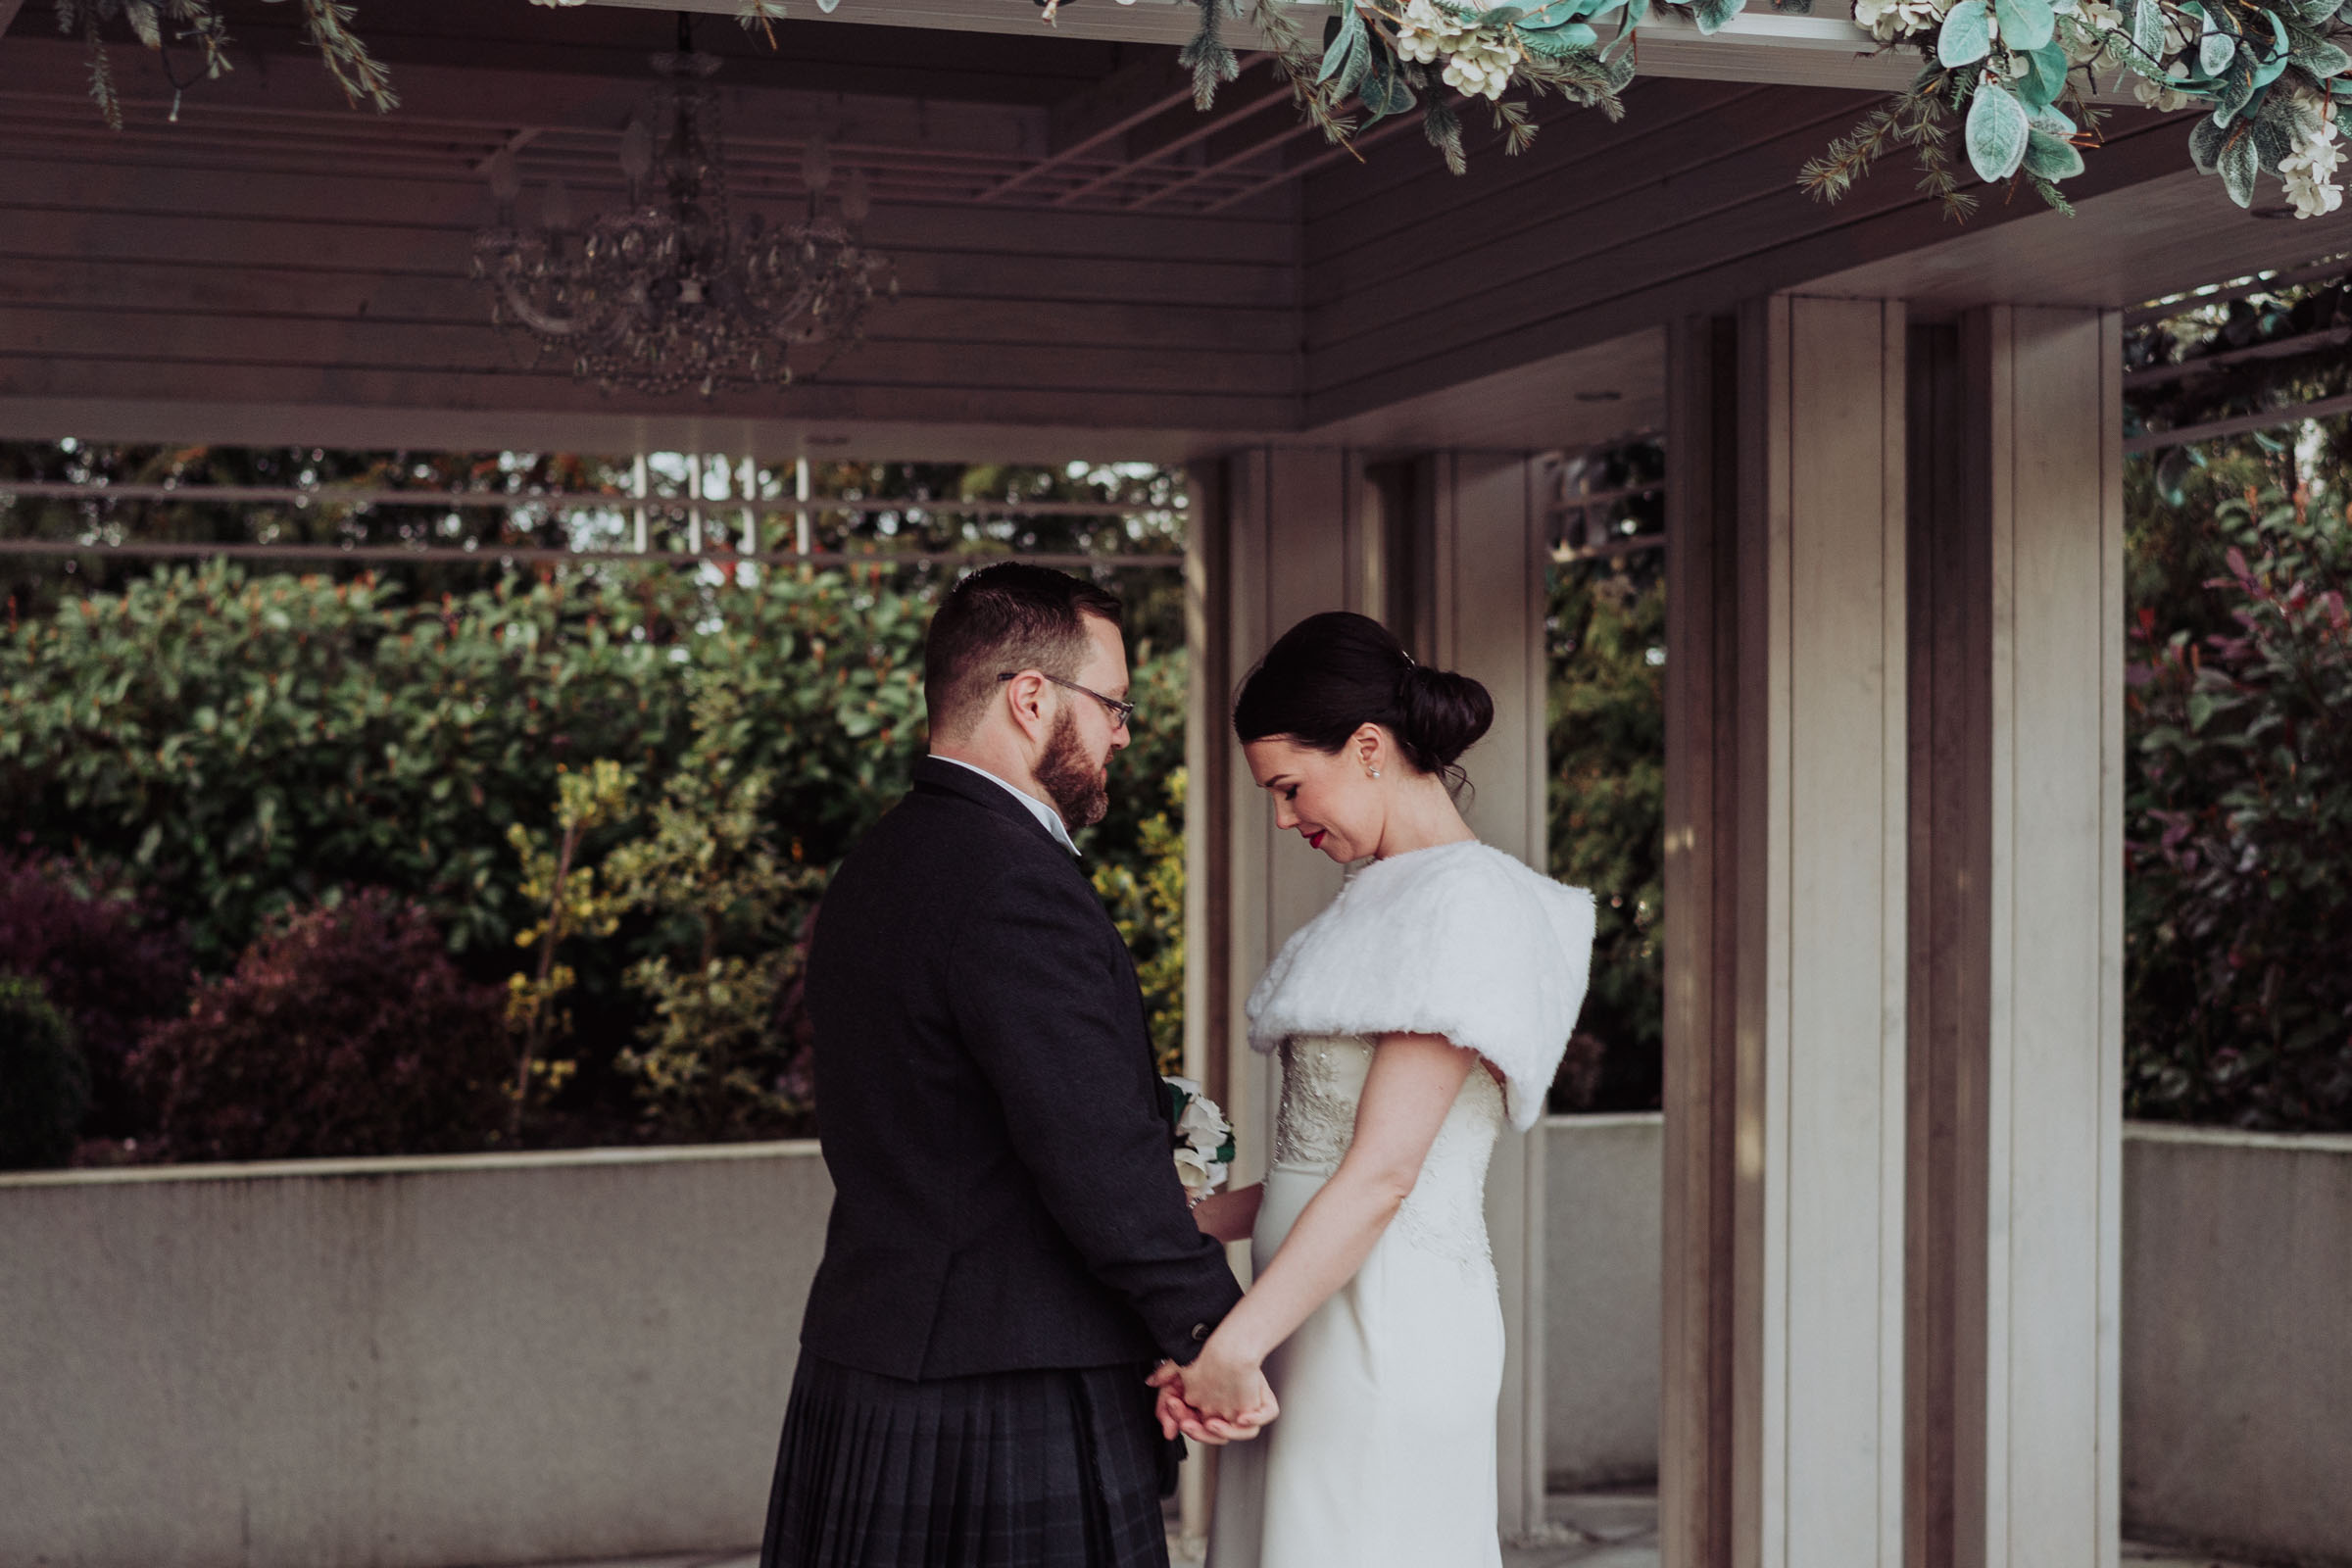 Radstone-Wedding-Dearly-Photography-Scotland (33 of 50).jpg